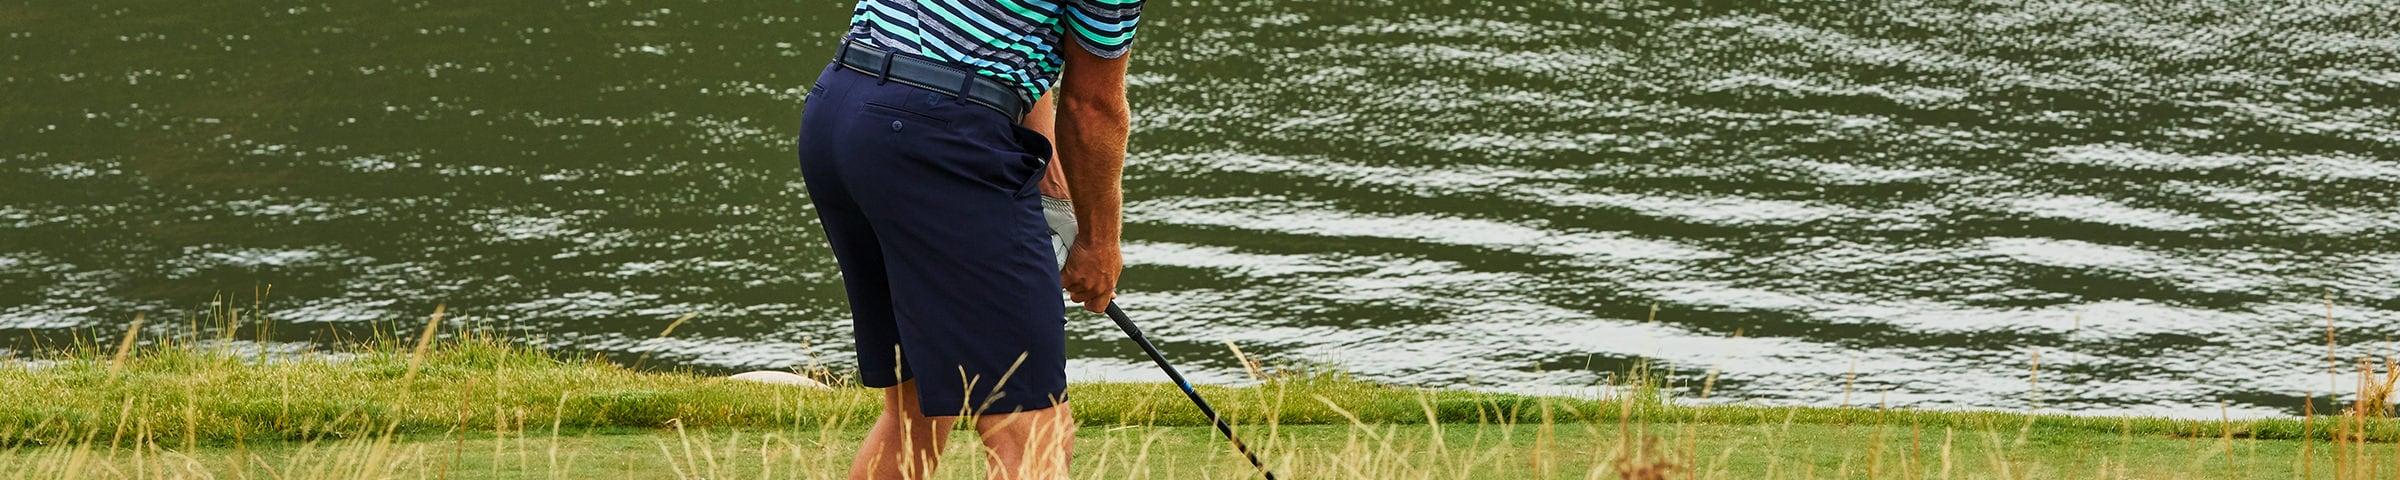 FootJoy 2019 Men's Golf Shorts